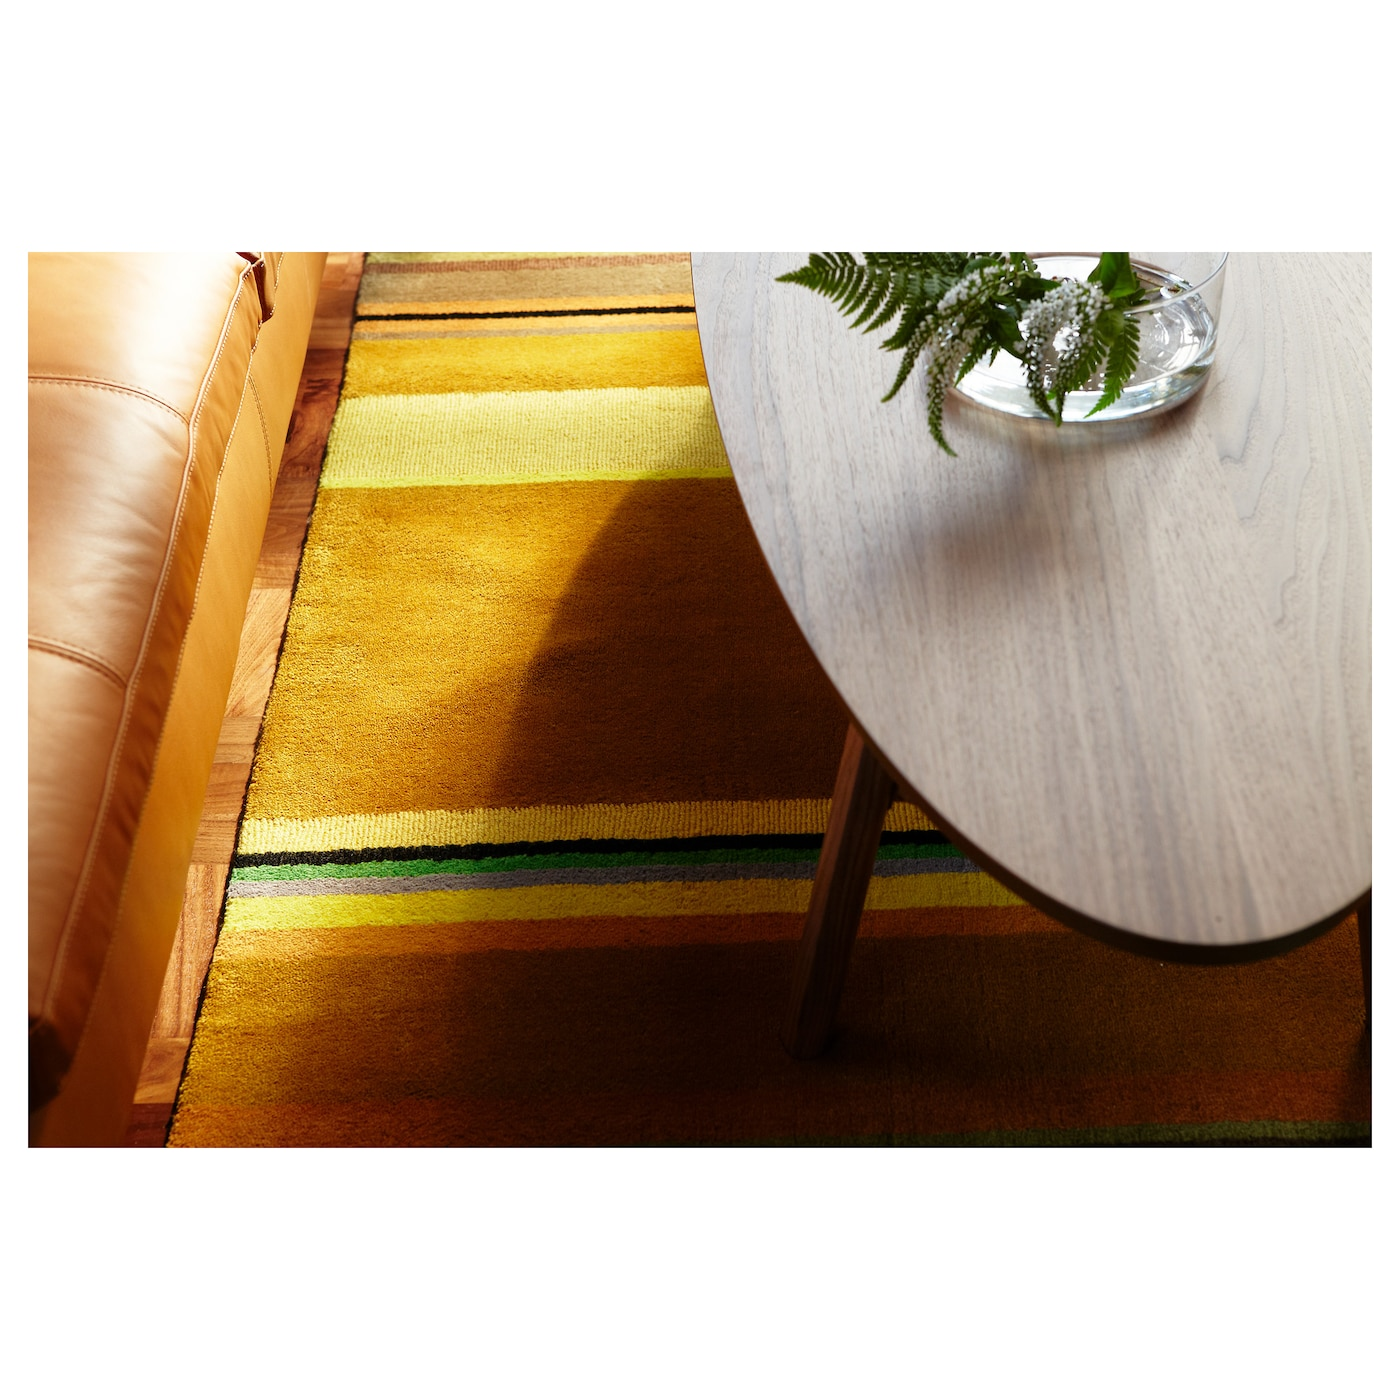 Stockholm table basse plaqu noyer 180x59 cm ikea - Table basse stockholm ...